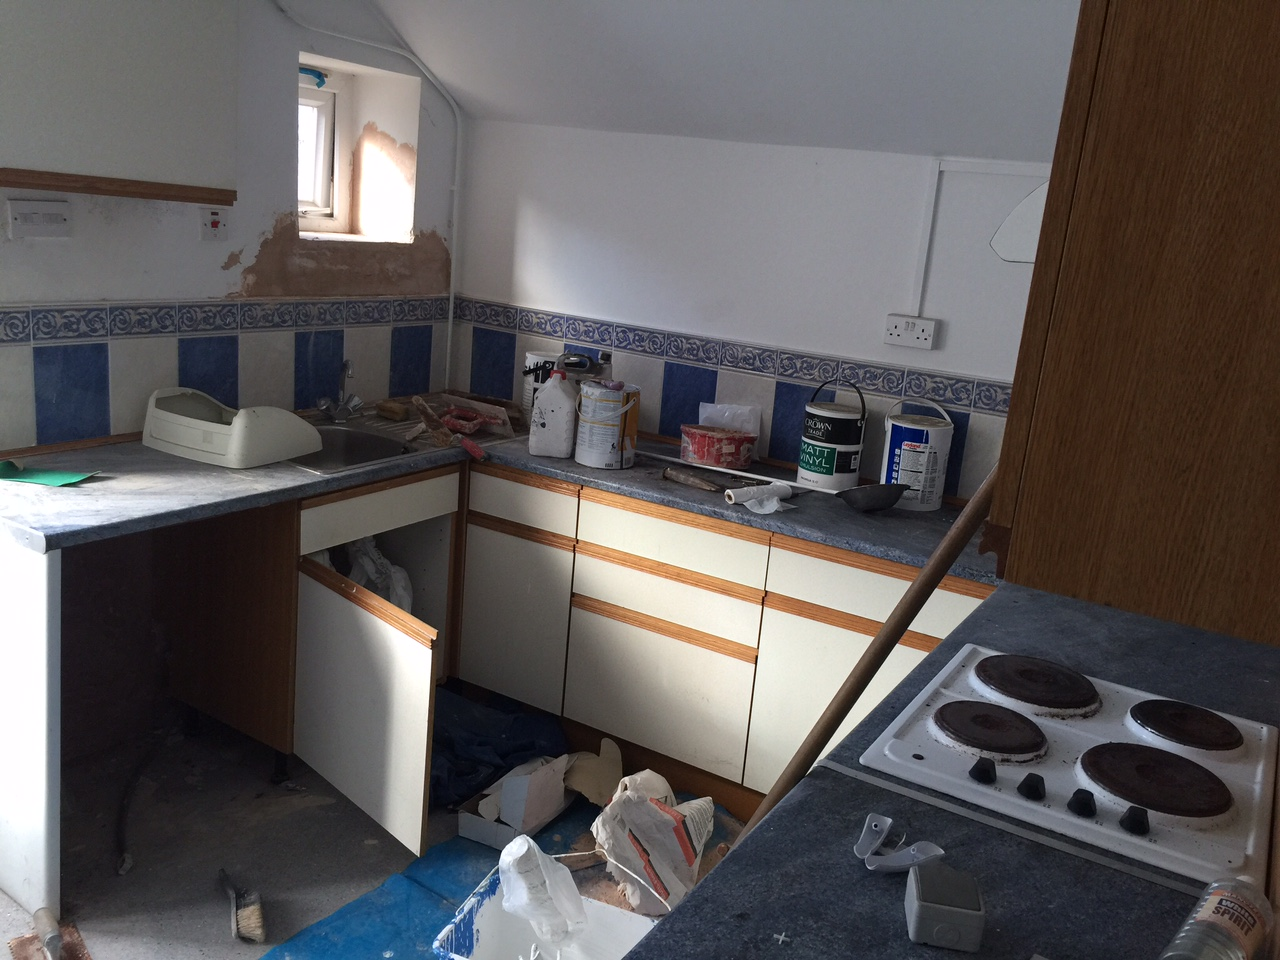 Kitchen, now the bathroom